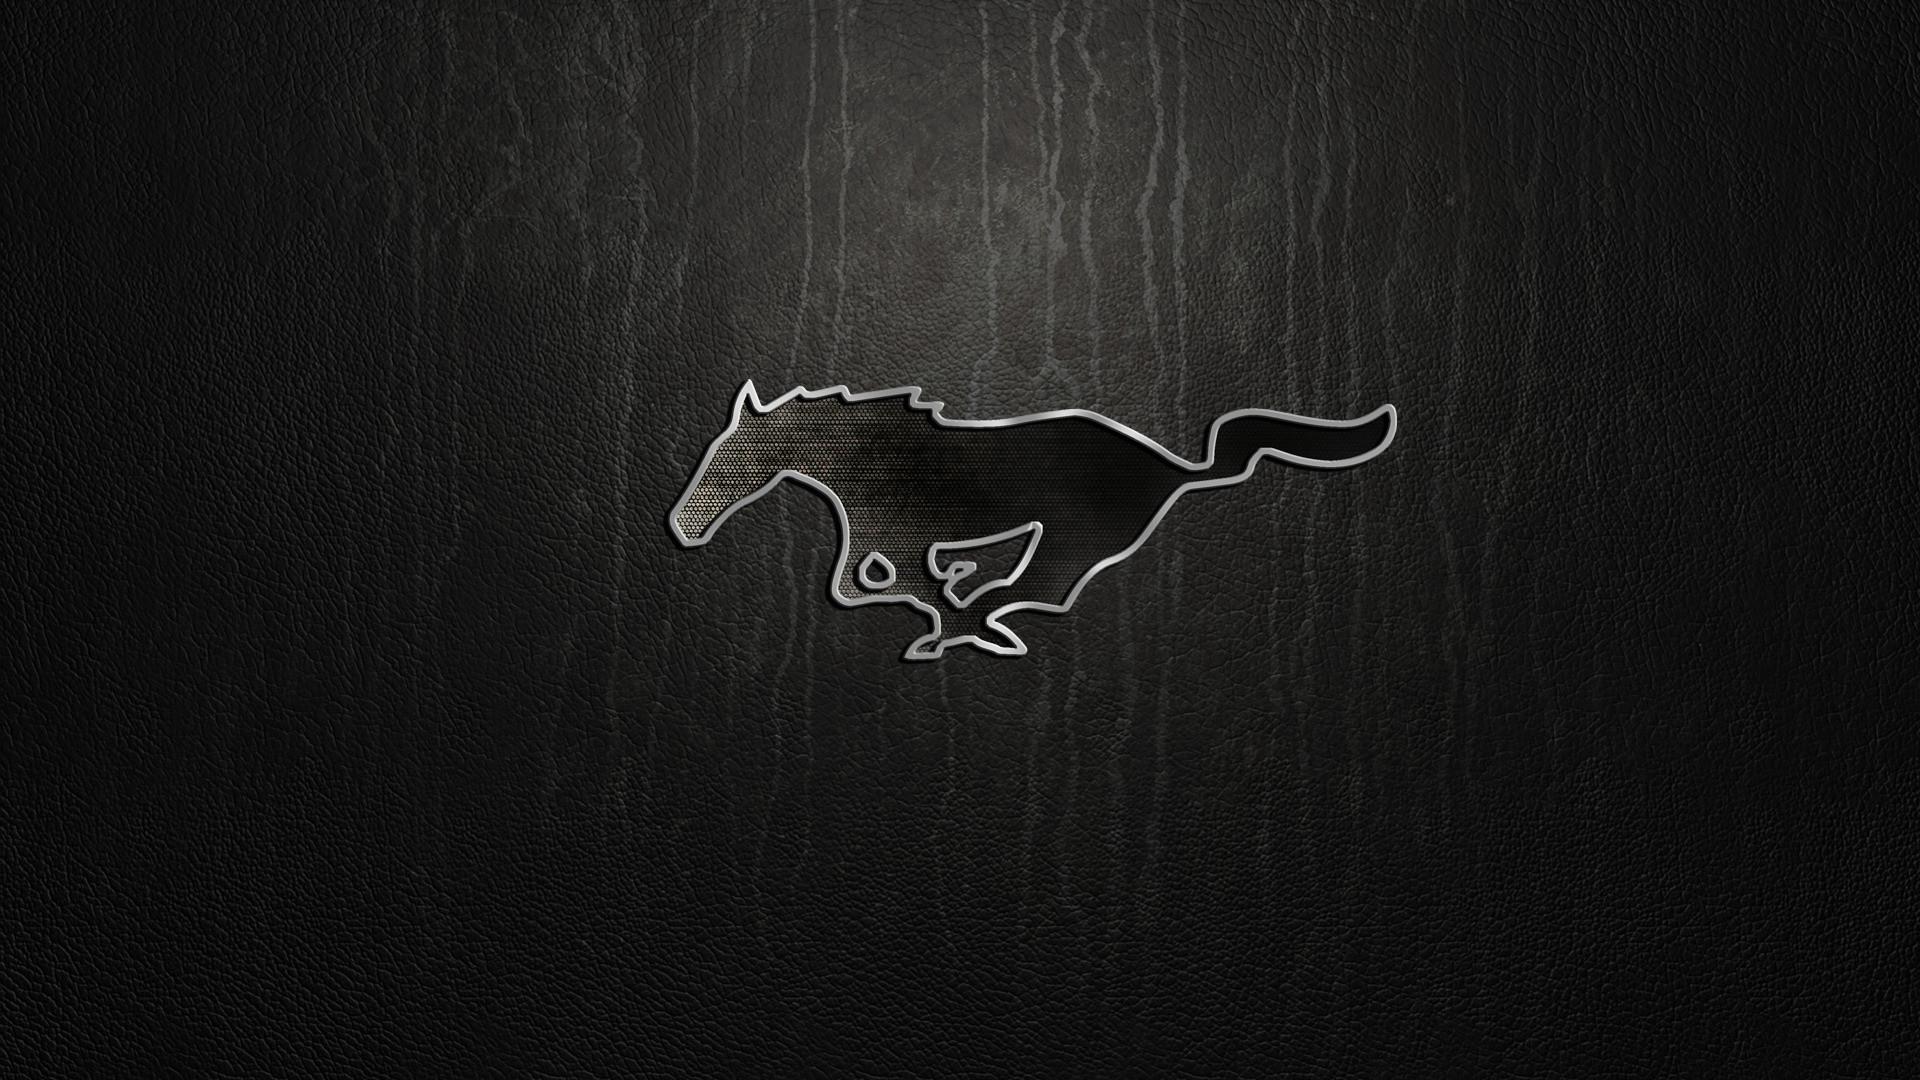 Dodge Logo Wallpaper Source Ram HD 57 Images